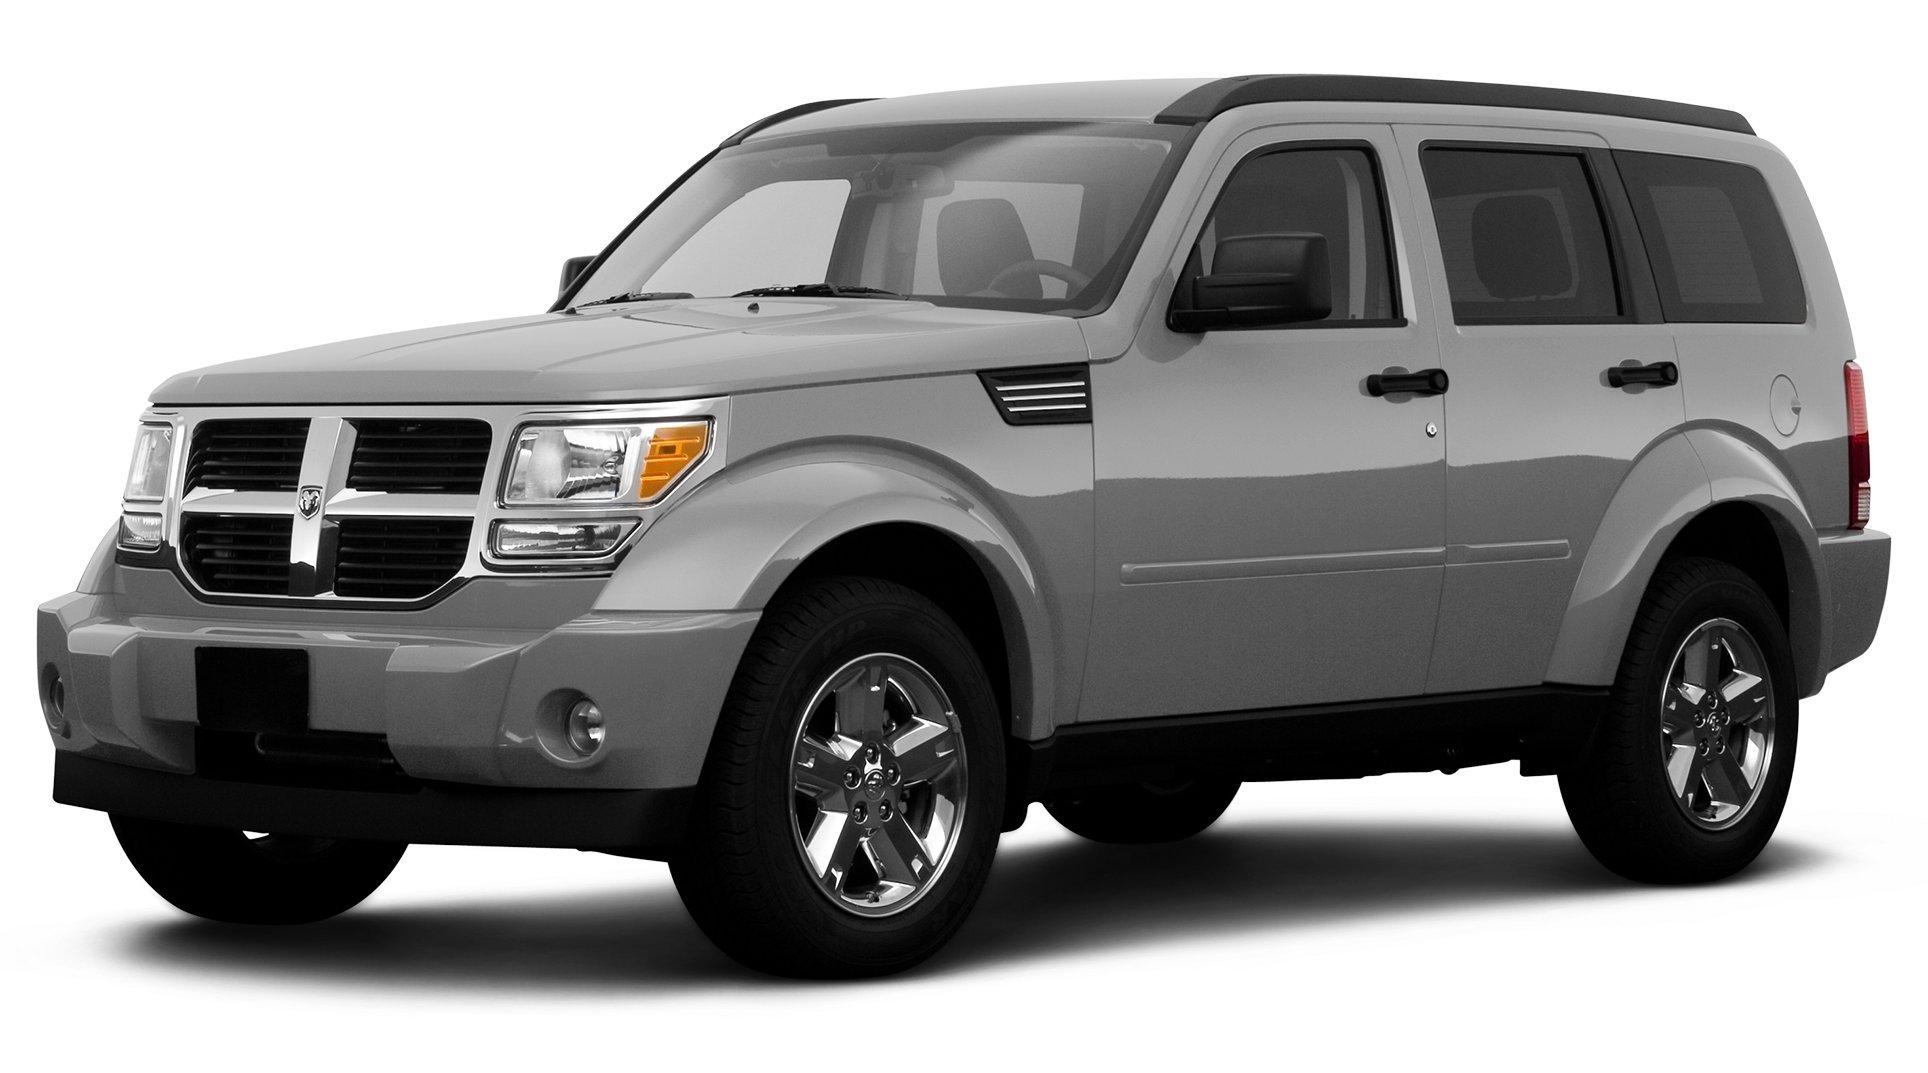 Amazon 2008 dodge nitro reviews images and specs vehicles 2008 dodge nitro rt 2 wheel drive 4 door sciox Choice Image